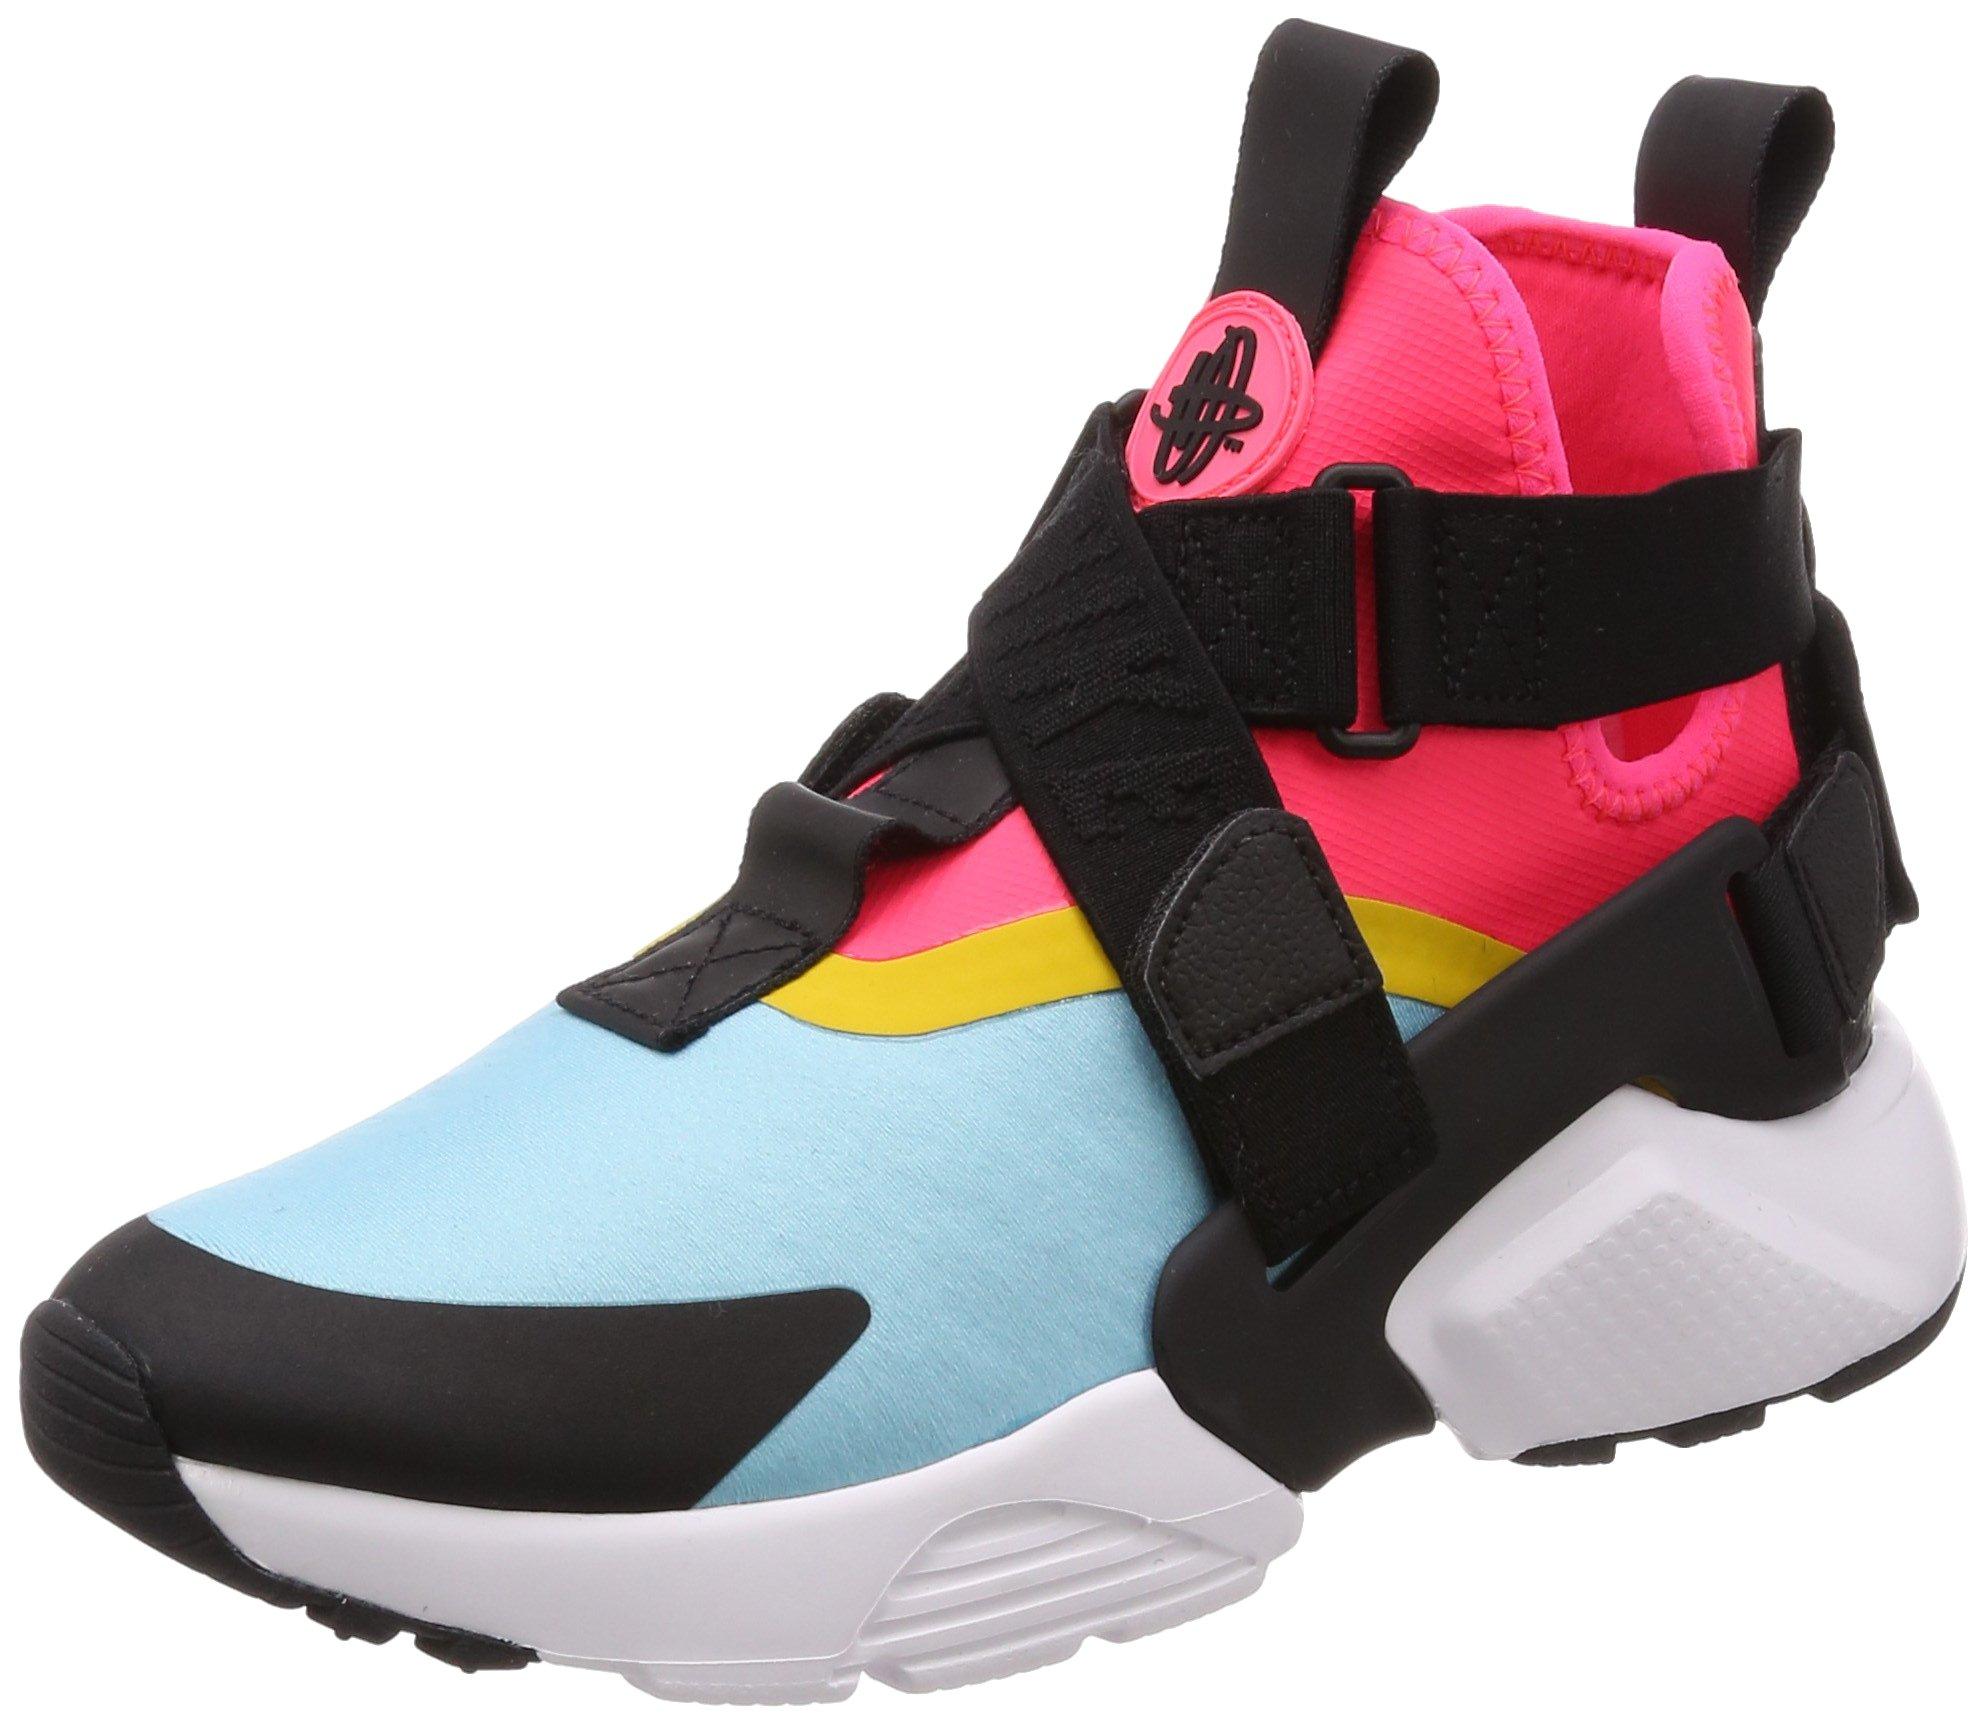 size 40 e0997 fa8a6 Galleon - NIKE Women s Air Huarache City Low-Top Sneakers, Multicolour Size  7.5 M US